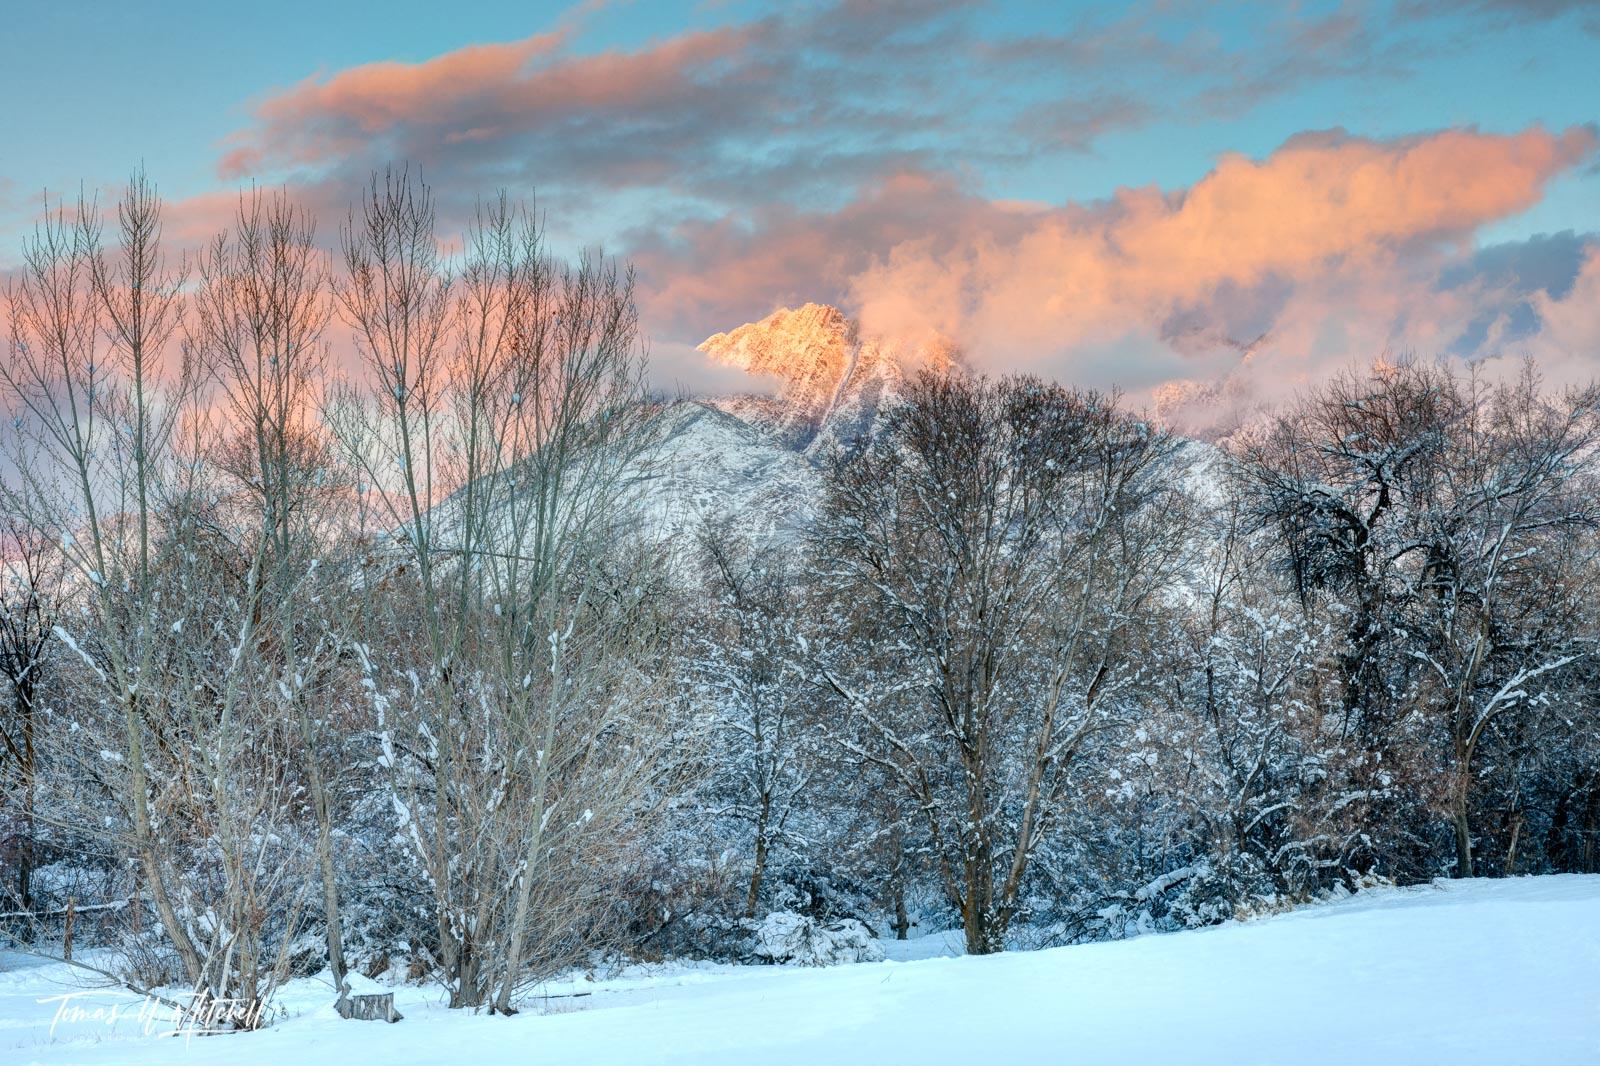 limited edition, fine art, prints, wheeler farm, utah, mount olympus, peaks, snow, clouds, sunset, afterglow, photograph, photo